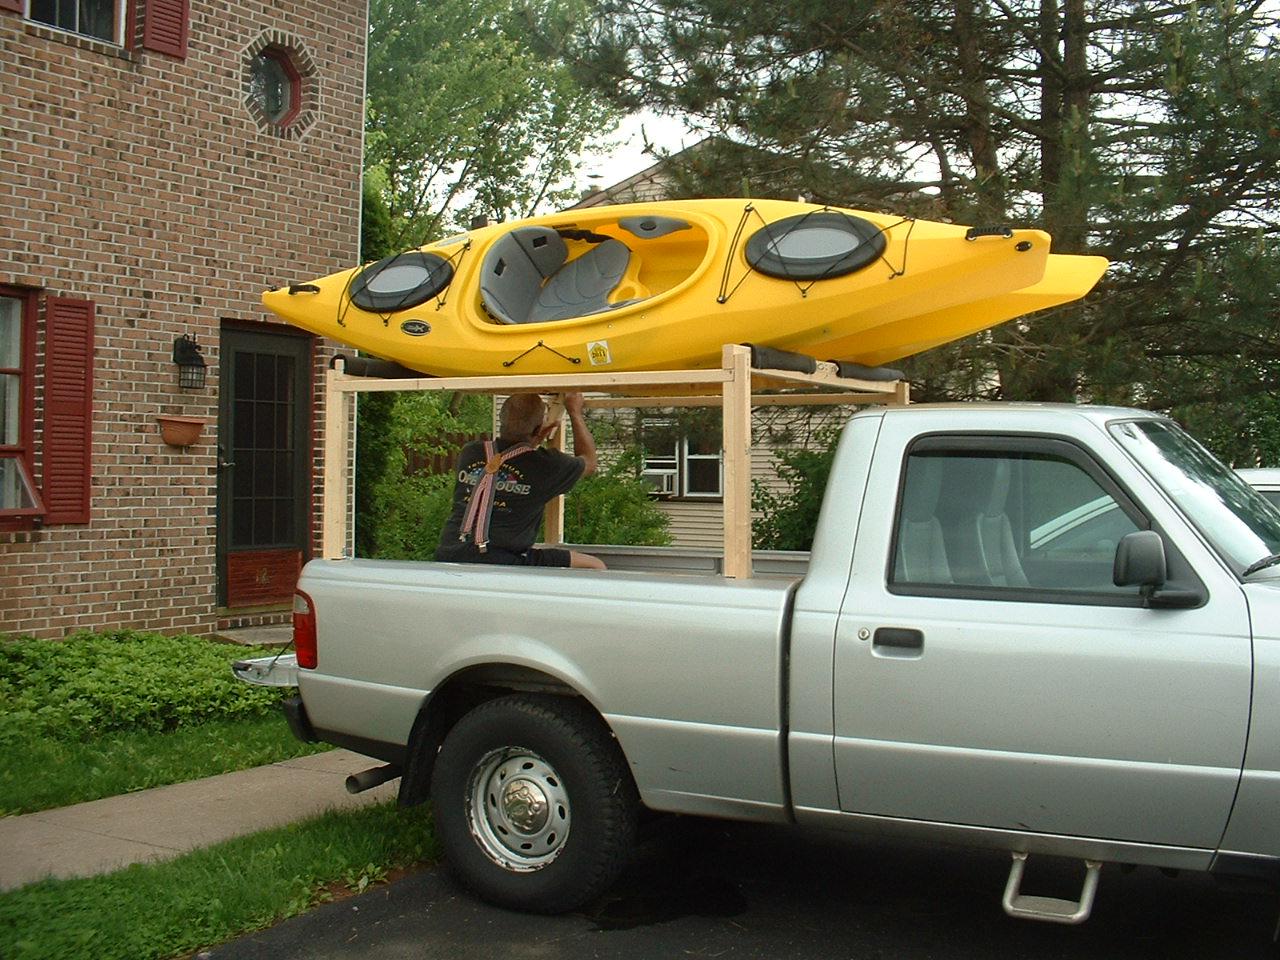 MadKayaker: Home made boat racks